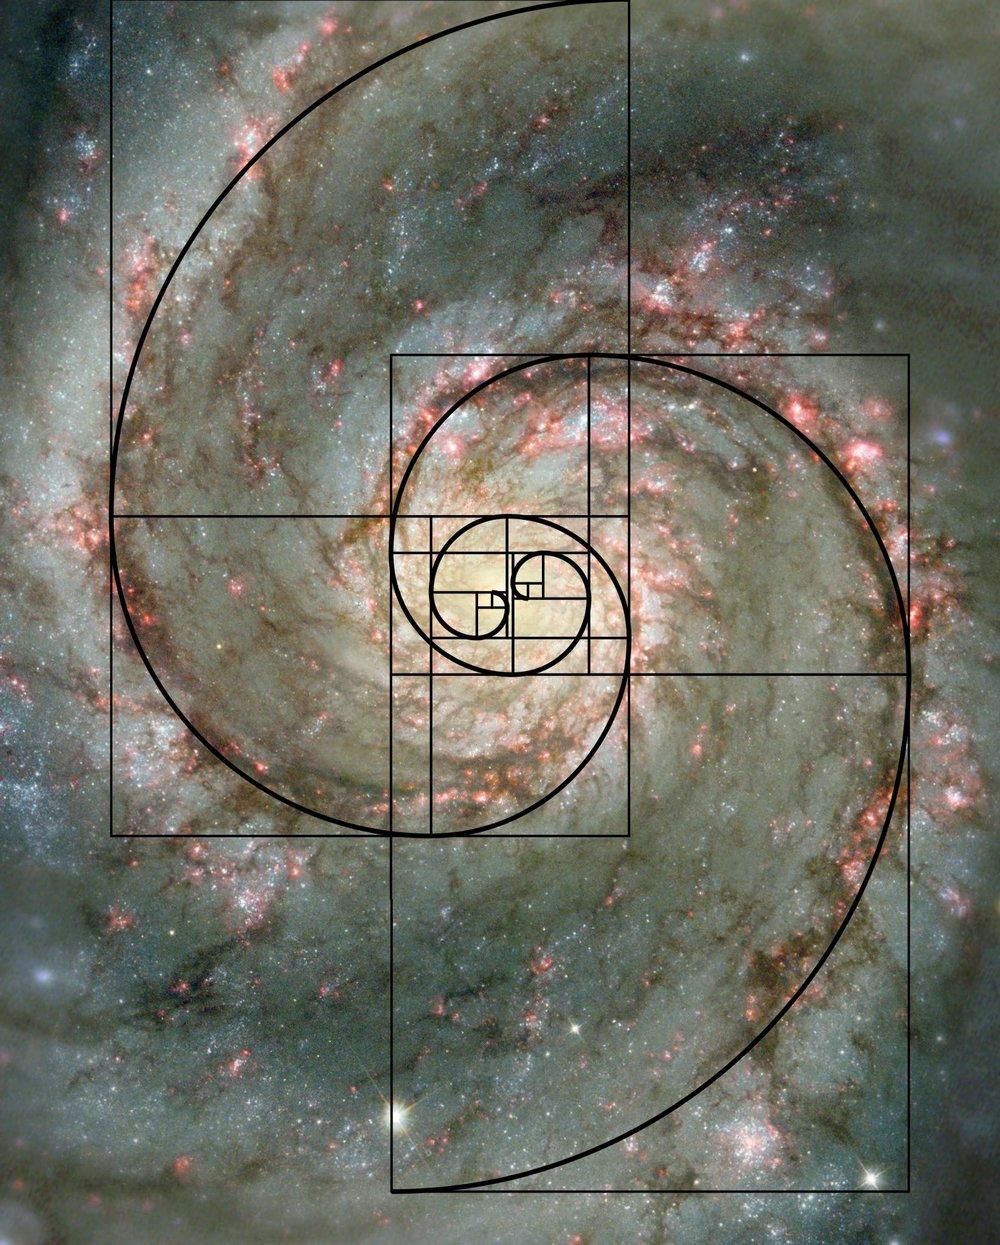 fibonacci-spiral-galaxy.jpg